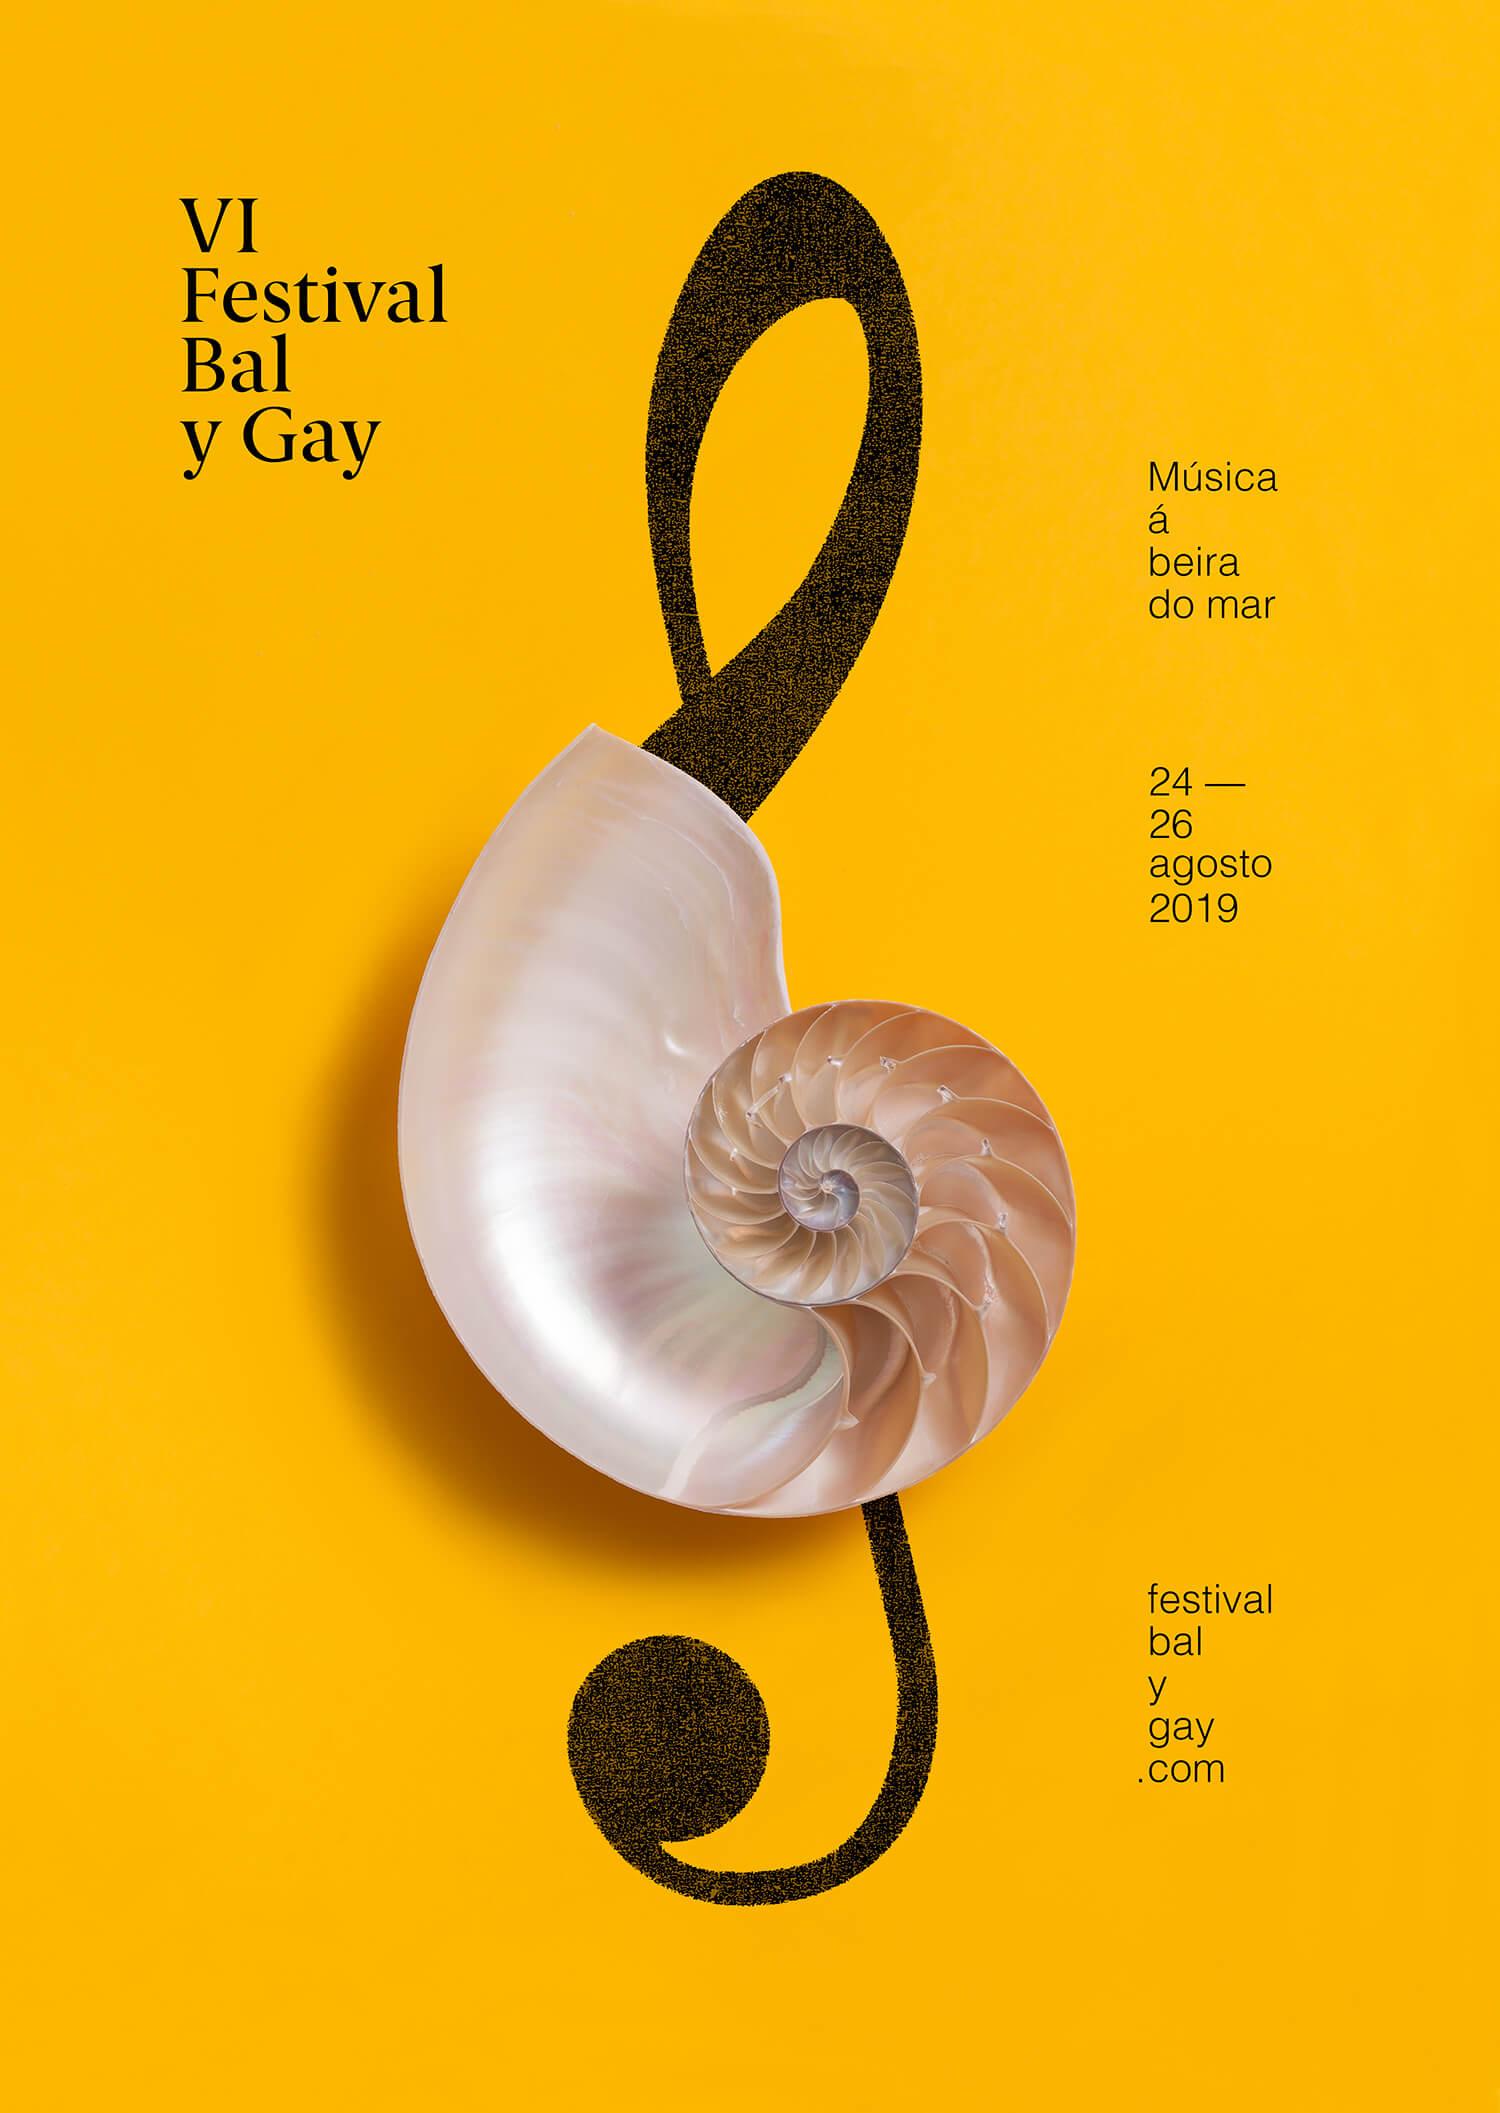 VI Festival Bal y Gay